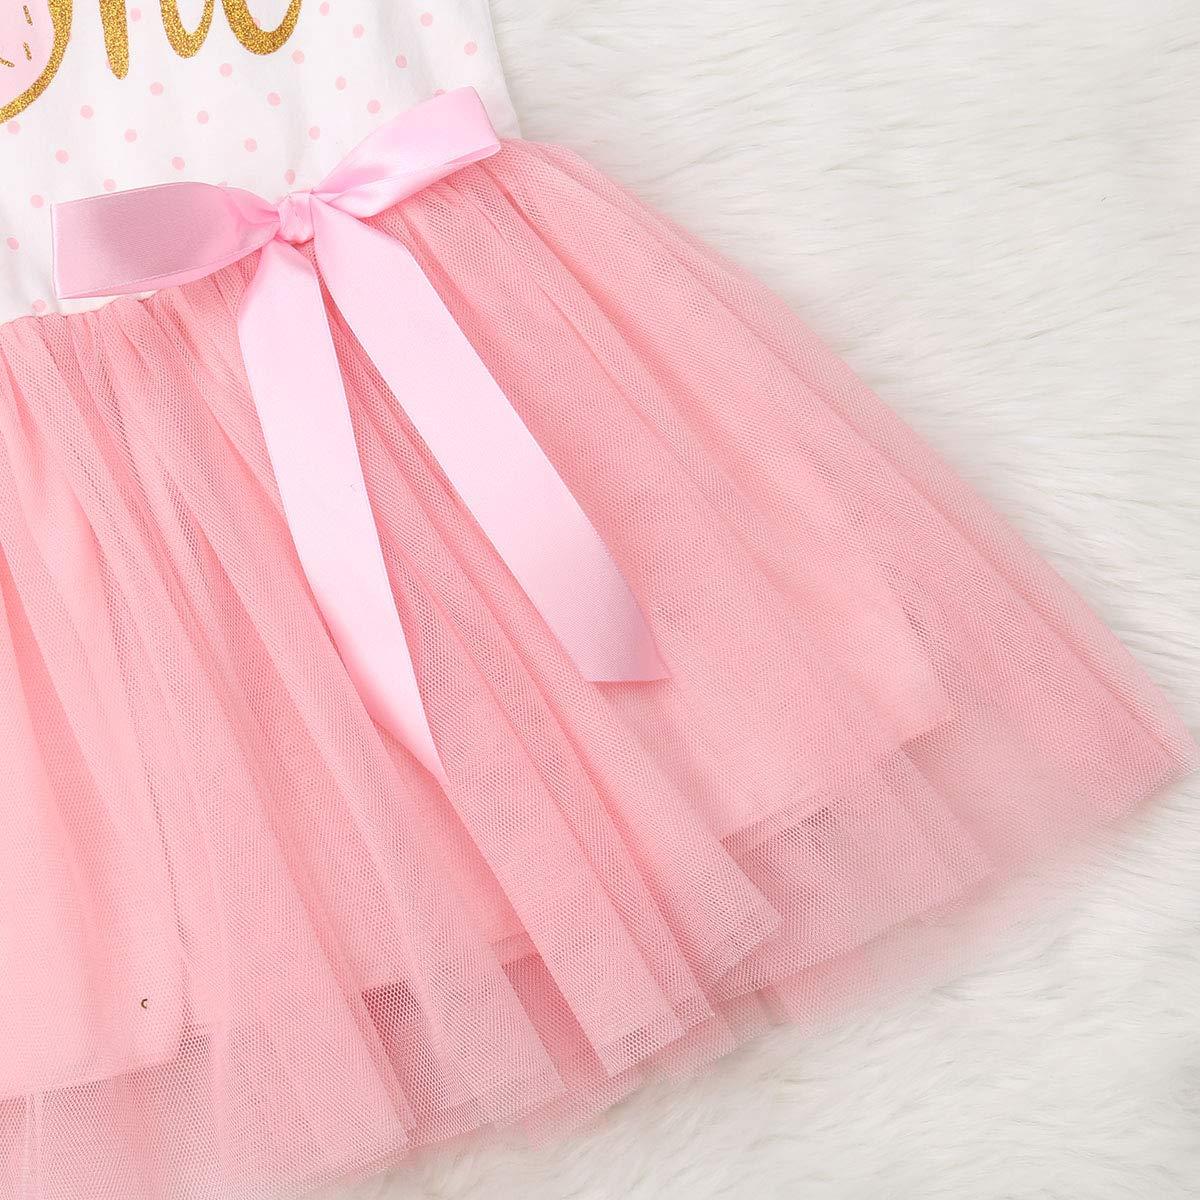 BAOSHI1 Newborn Infant Baby Girls Pink Striped Tutu Dress,Toddler Kids Donut Tulle Dress Bowknot Headband Set